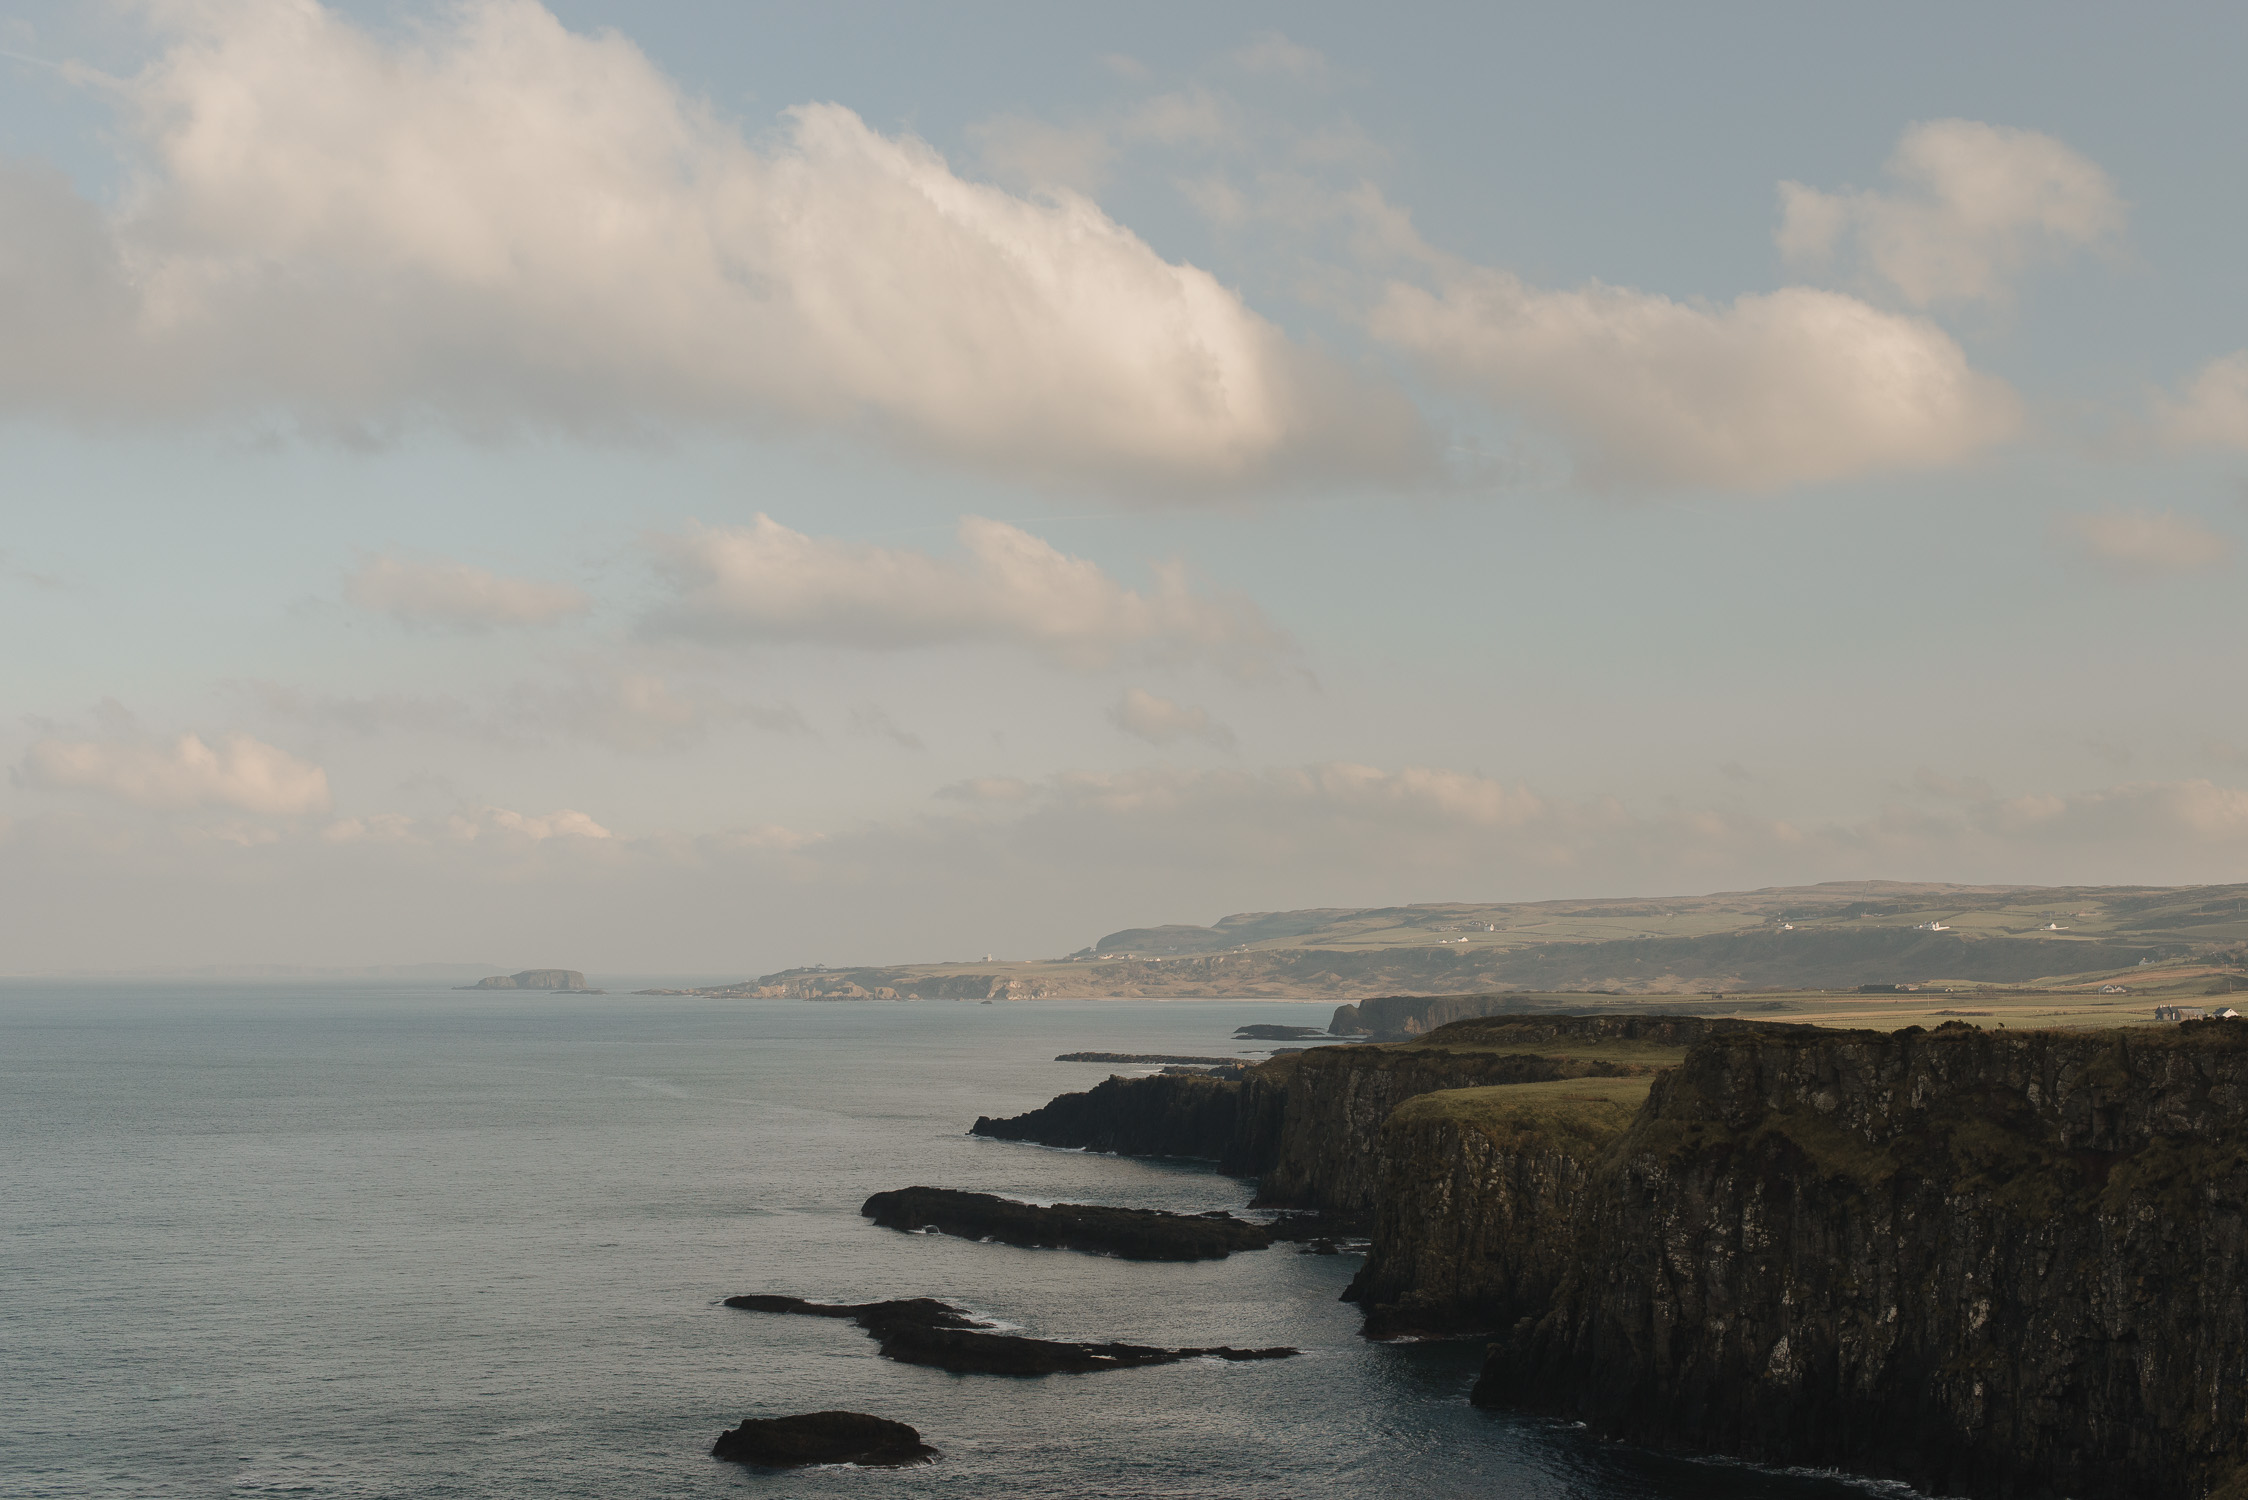 giants causeway photographs-1.jpg